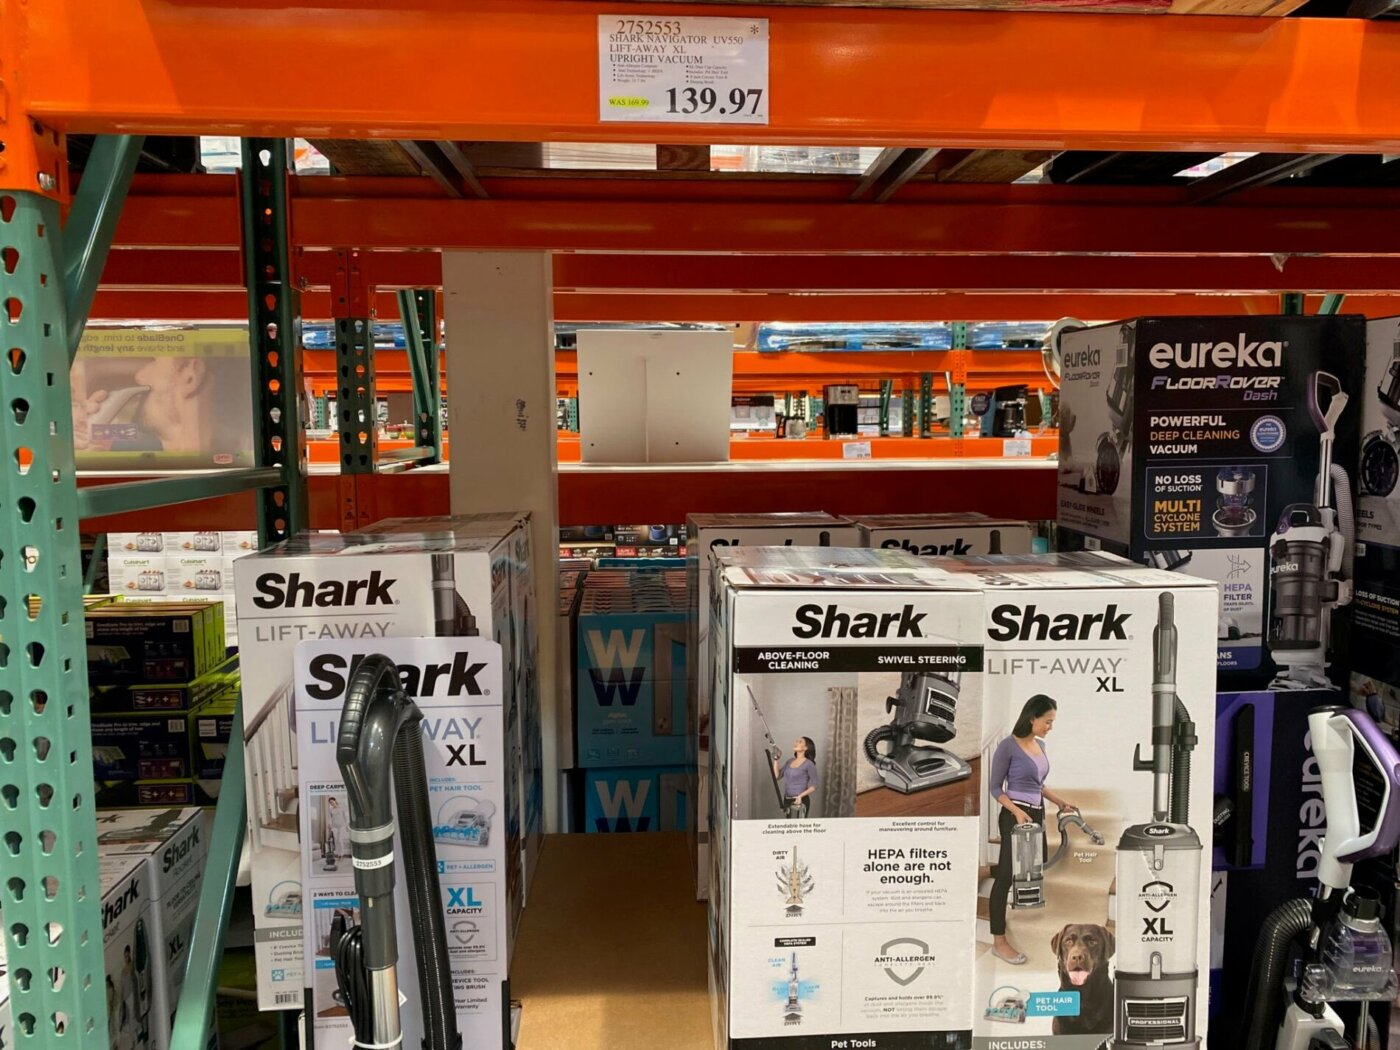 SharkNavigatorUV550LiftAwayXLUprightVacuum-2752553